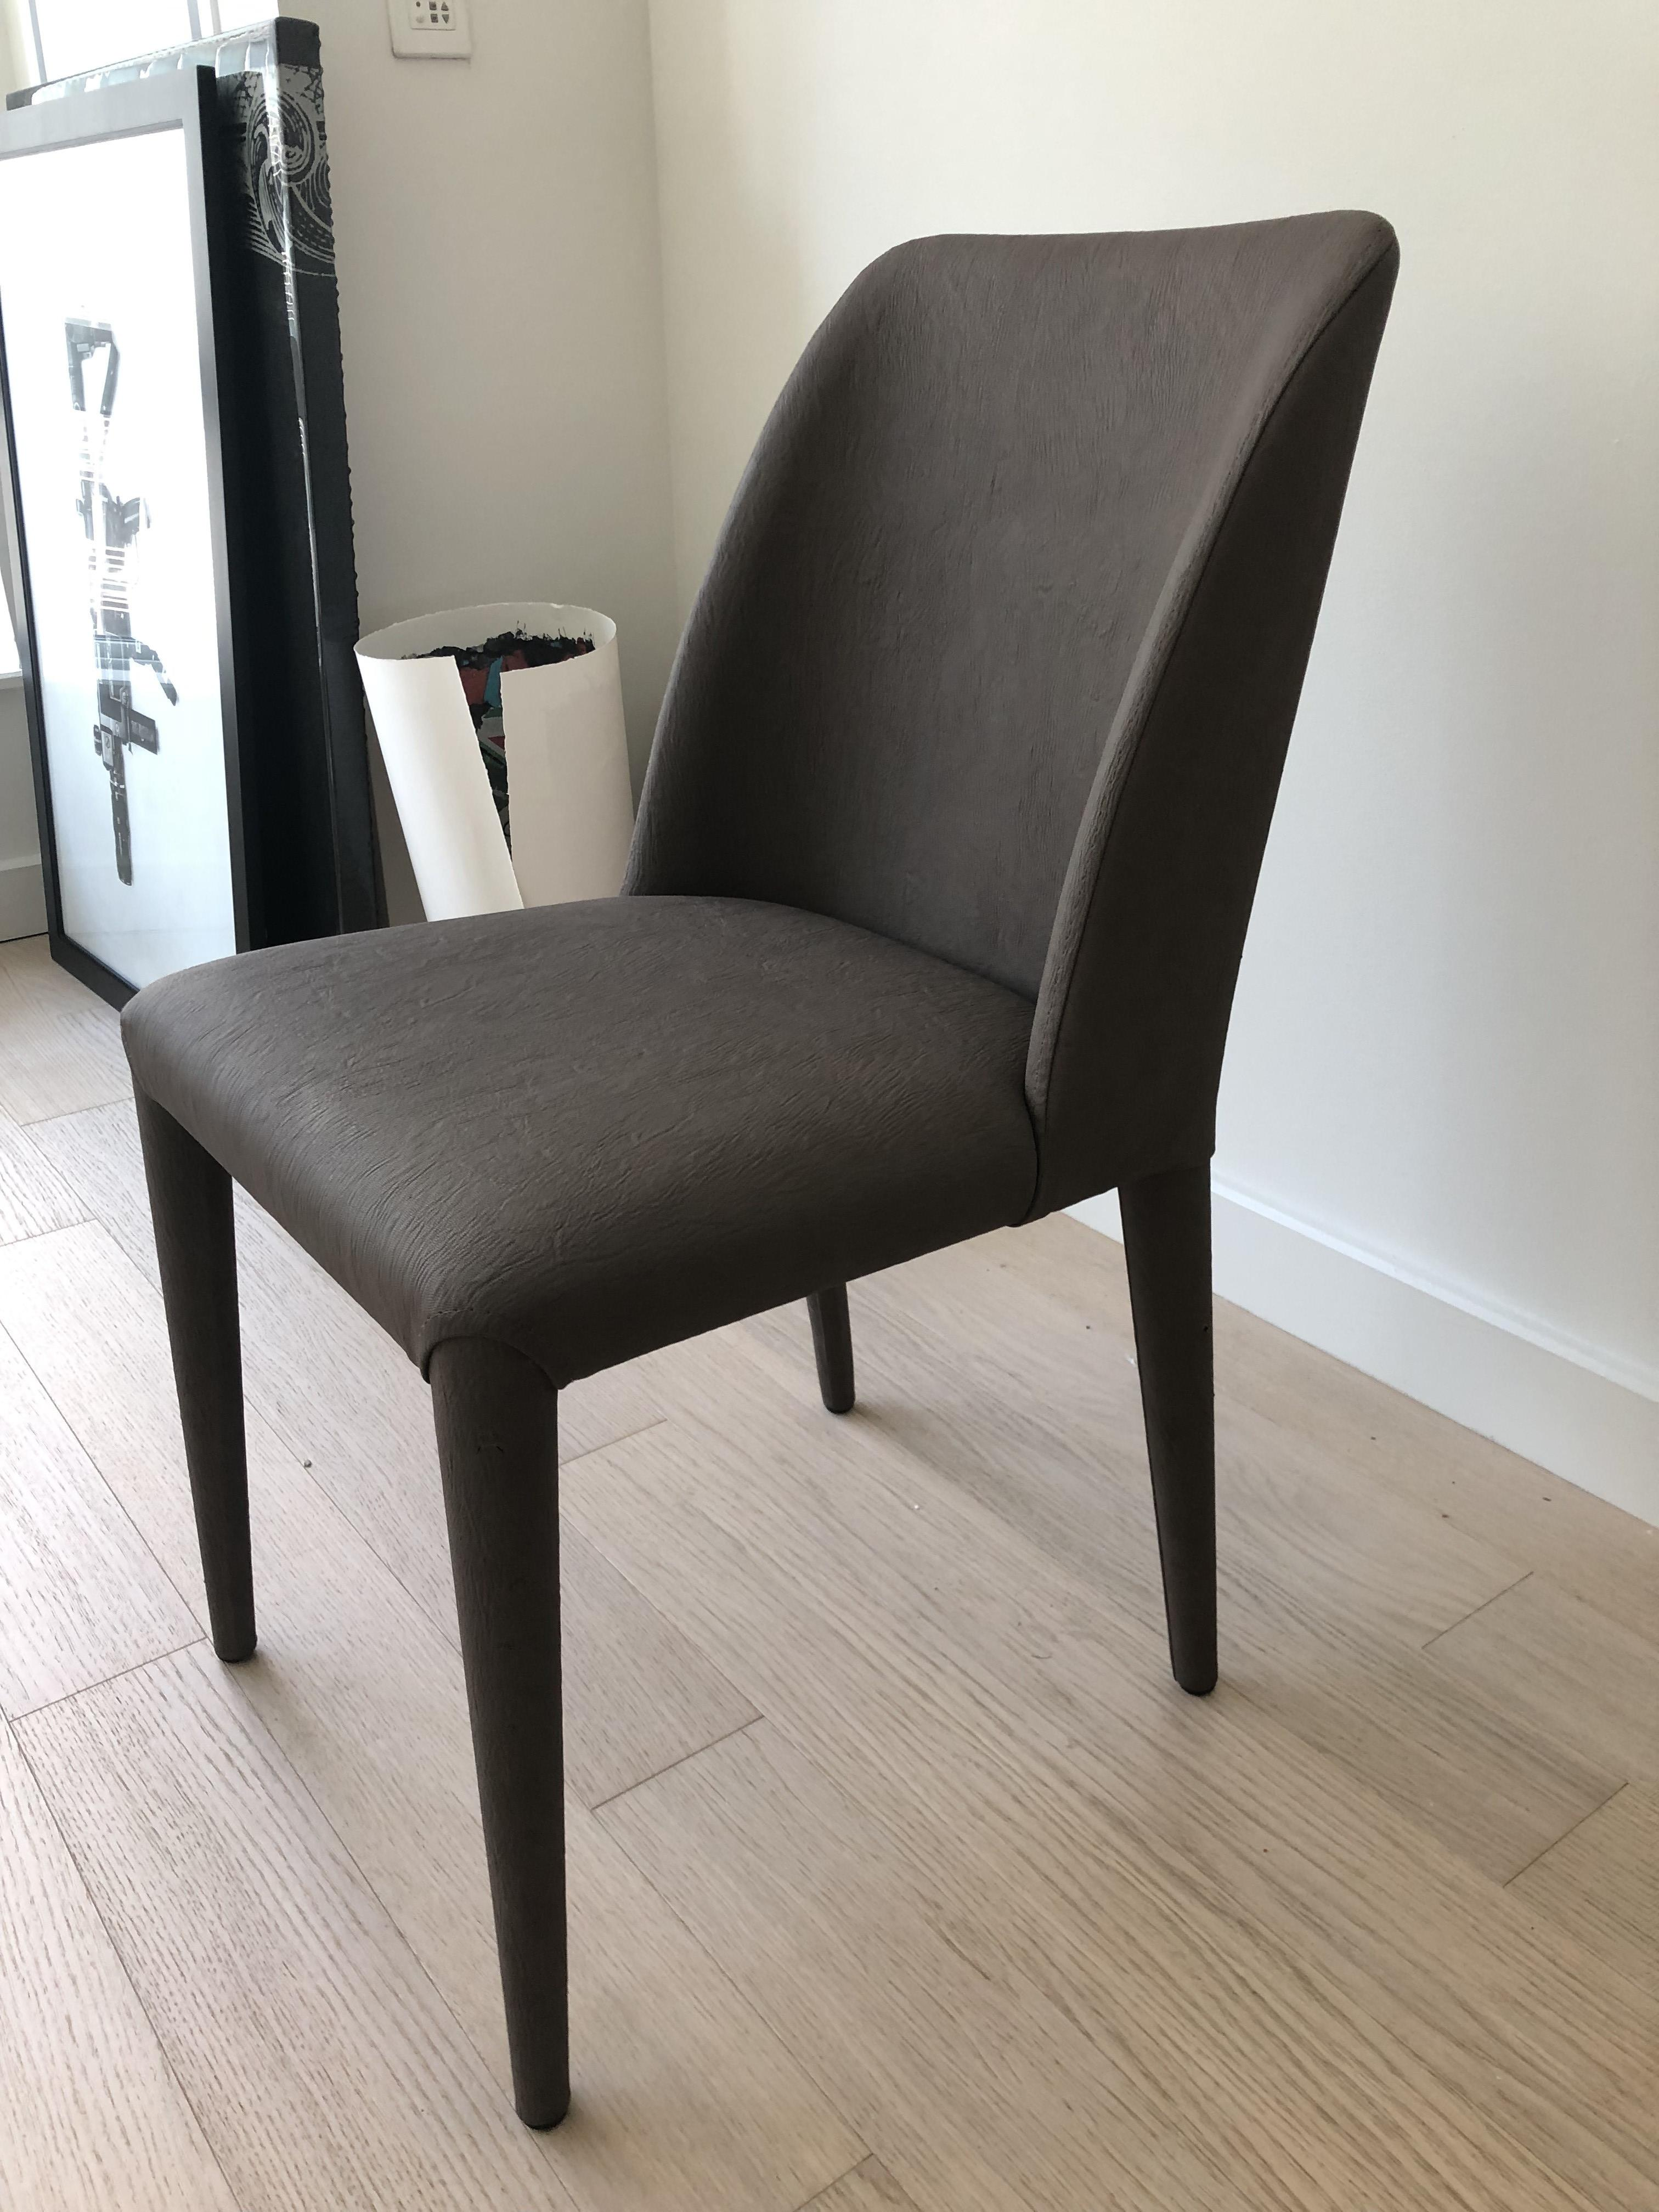 Lazzoni Aria Dining Chairs